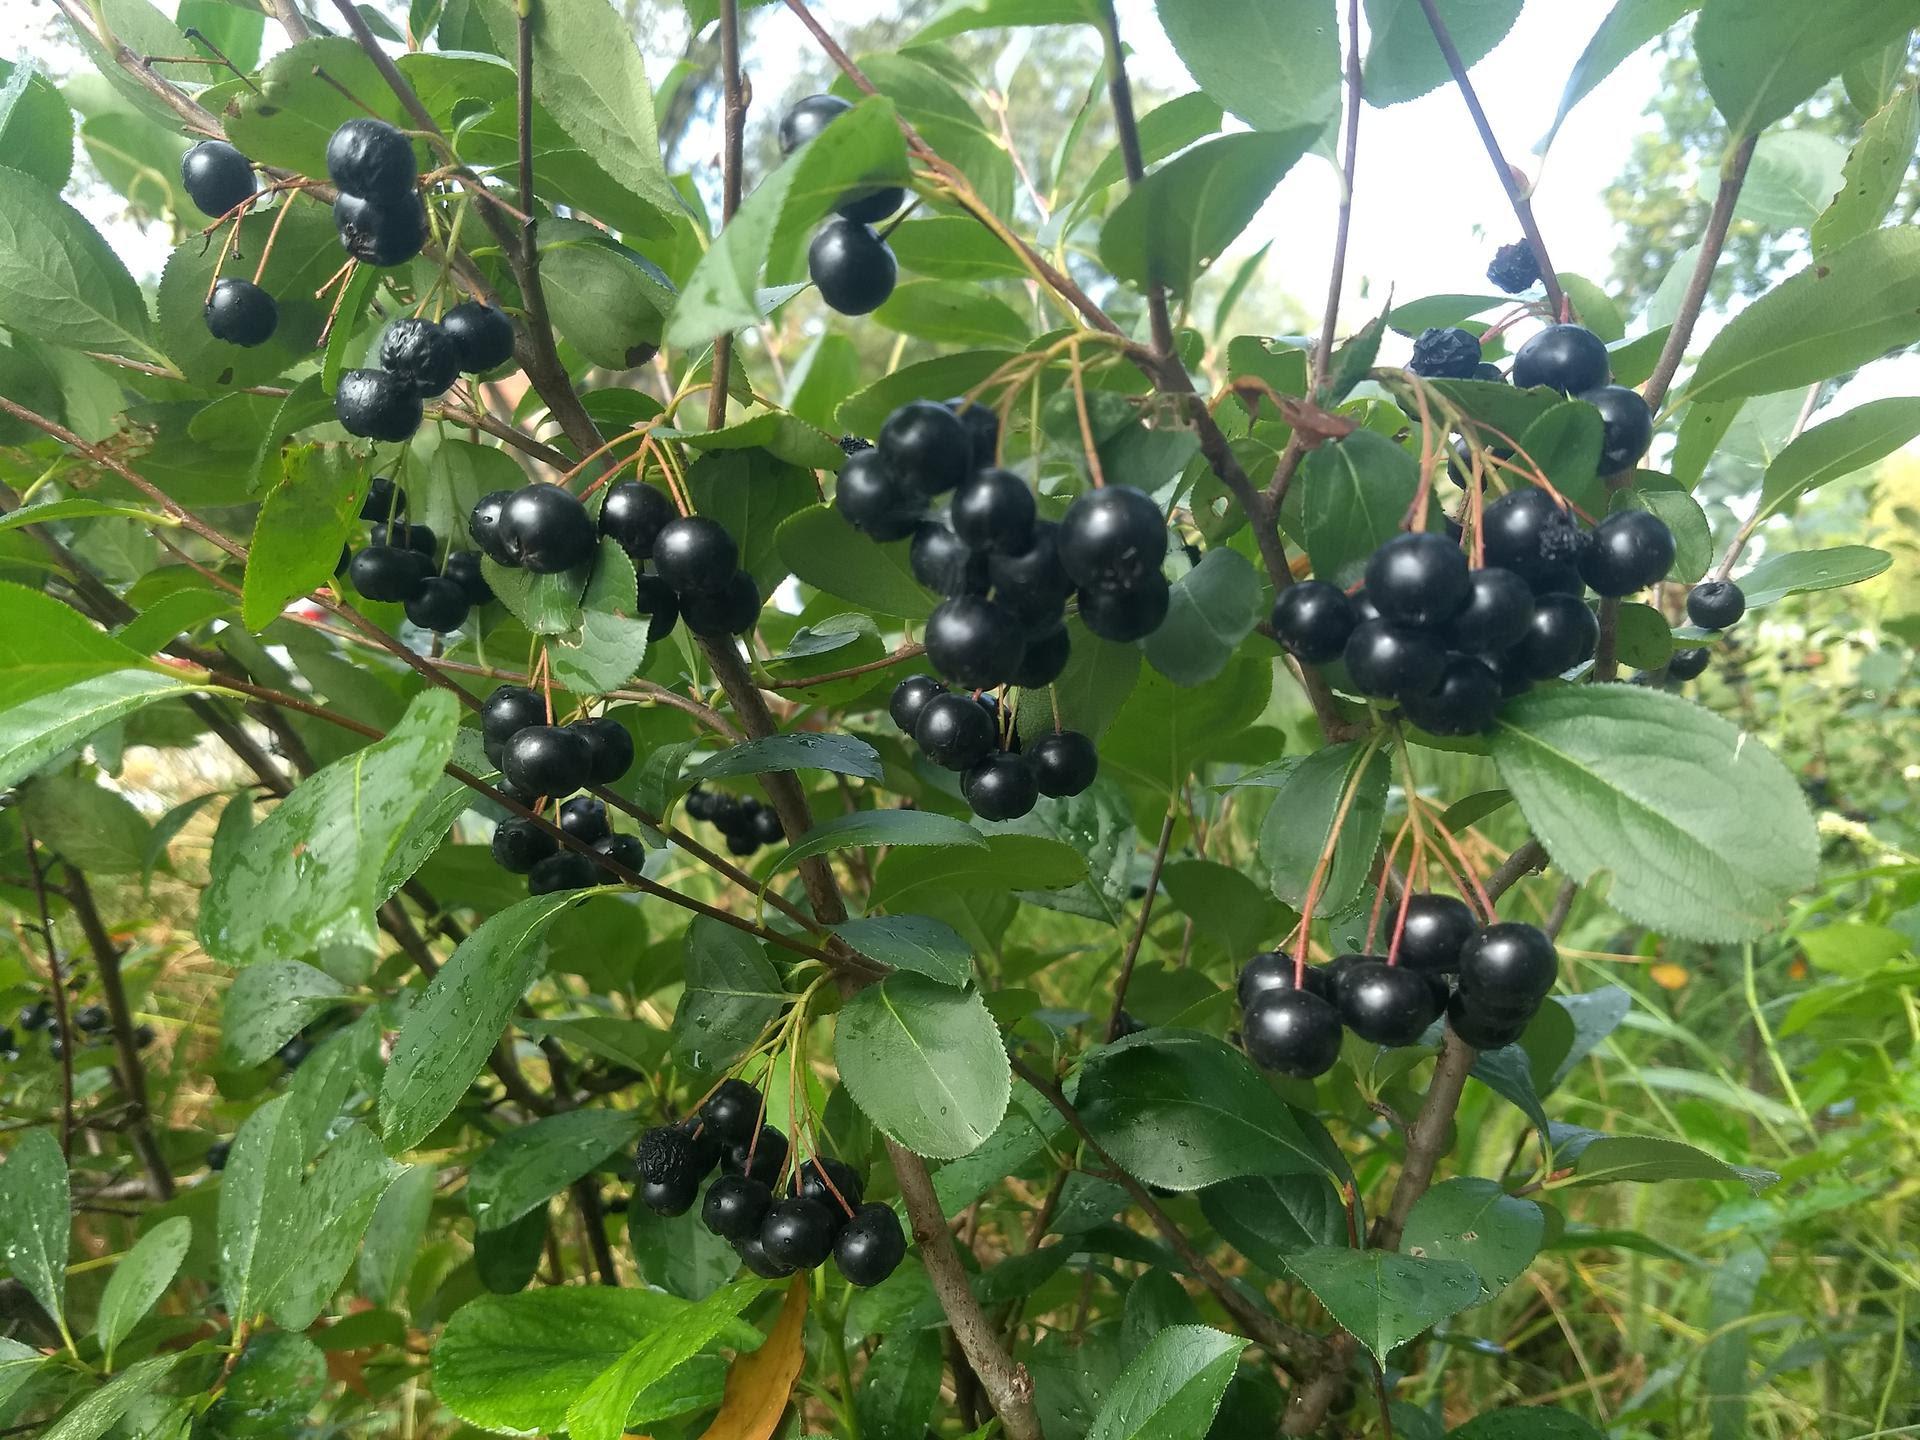 Dark purple chokeberries on a productive shrub